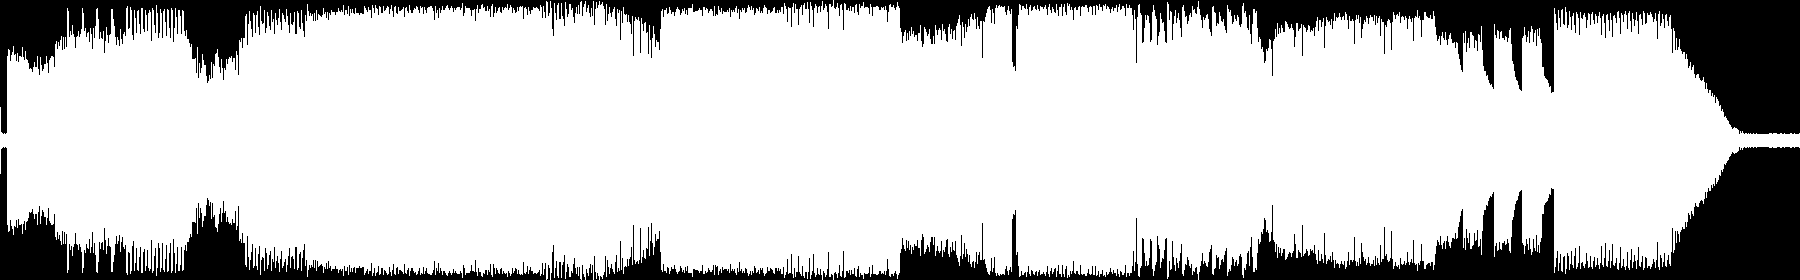 EDM Banger-Aid audio waveform